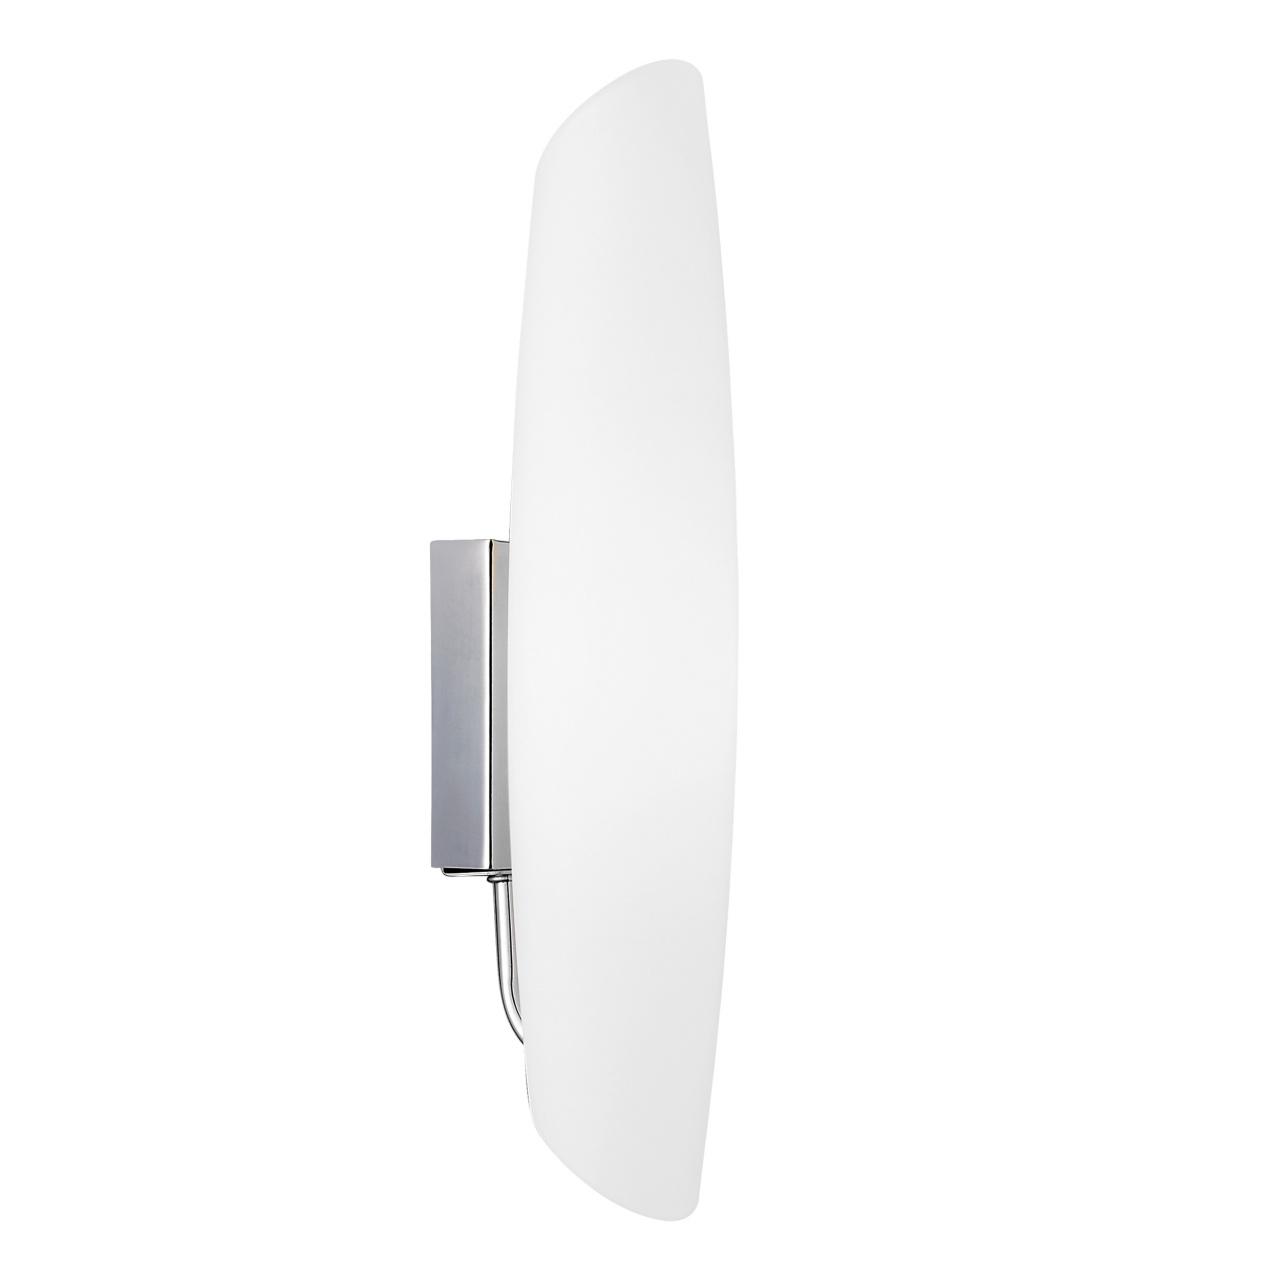 Светильник настенный Dissimo 1х40W E14 хром / белый Lightstar 803600